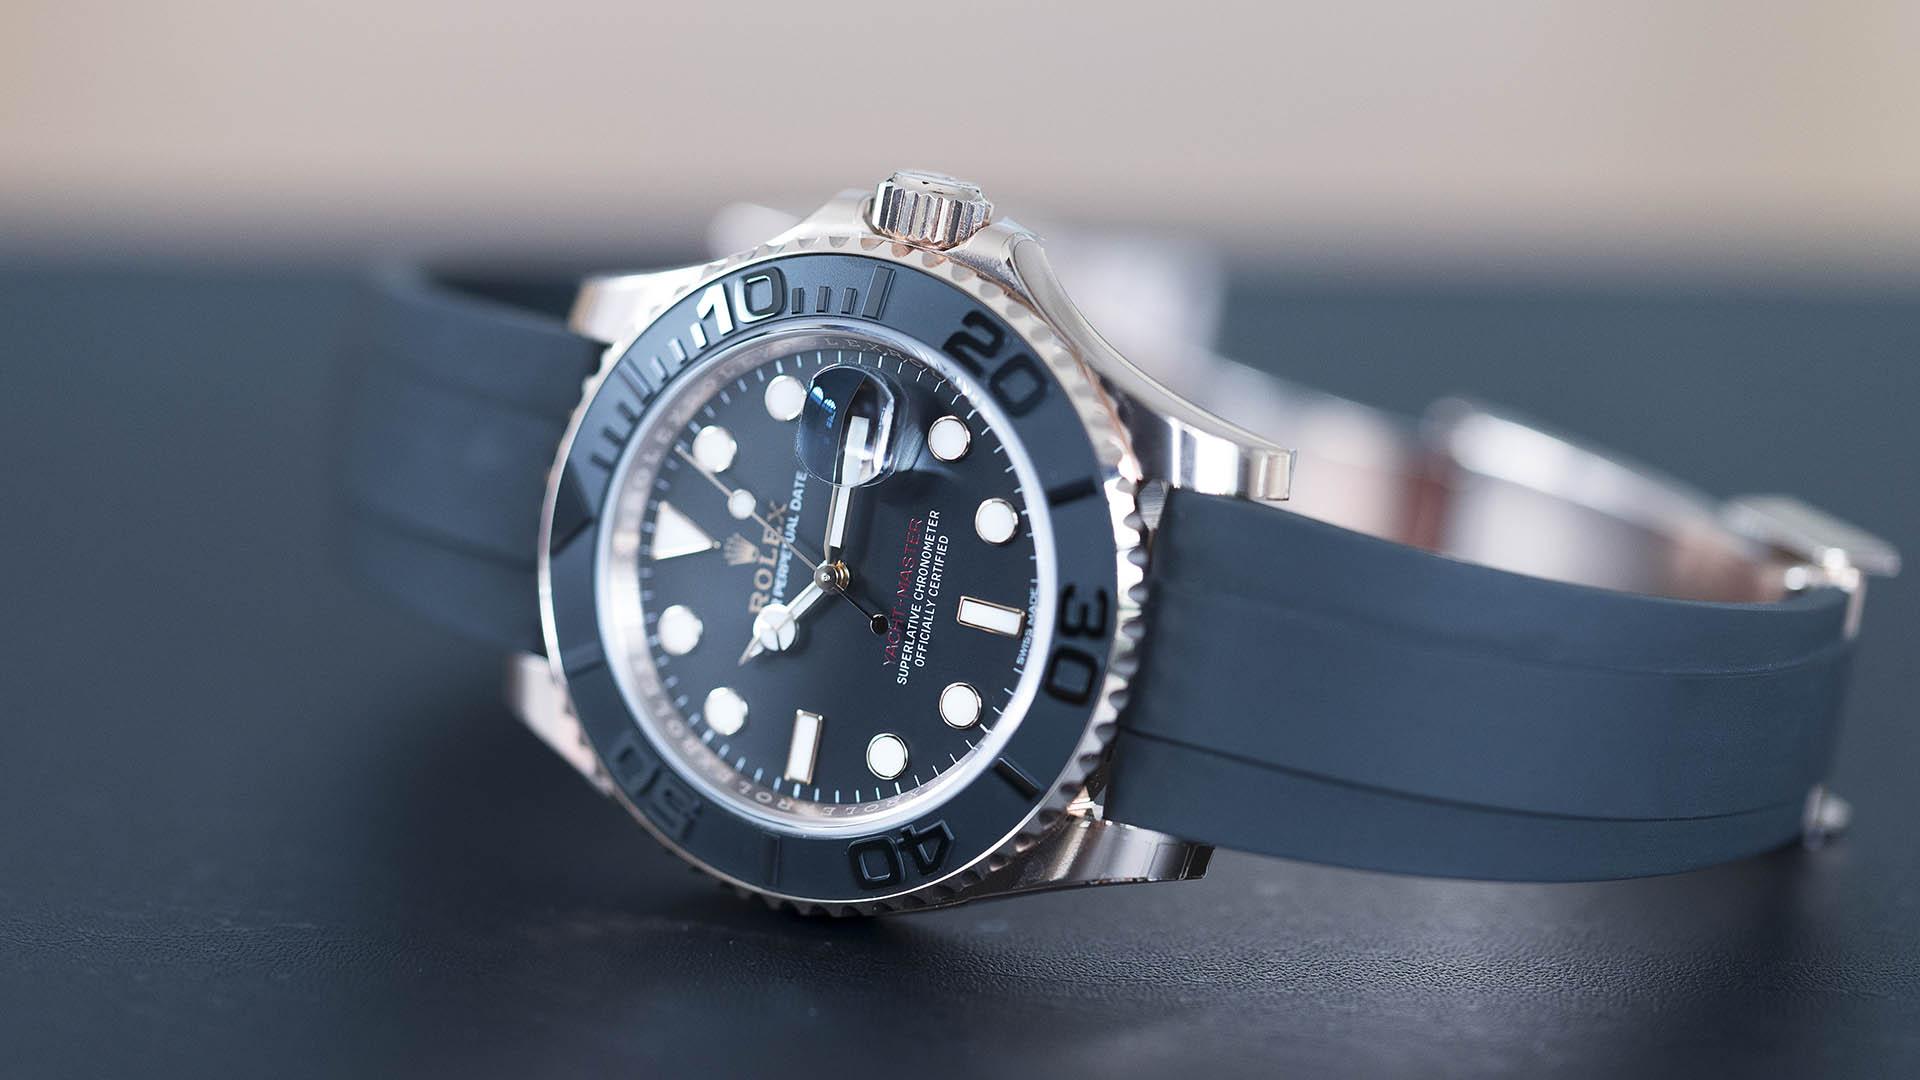 Rolex_YACHT-MASTER_40_Oyster_40mm_Everose_Gold_116655_9s.jpg